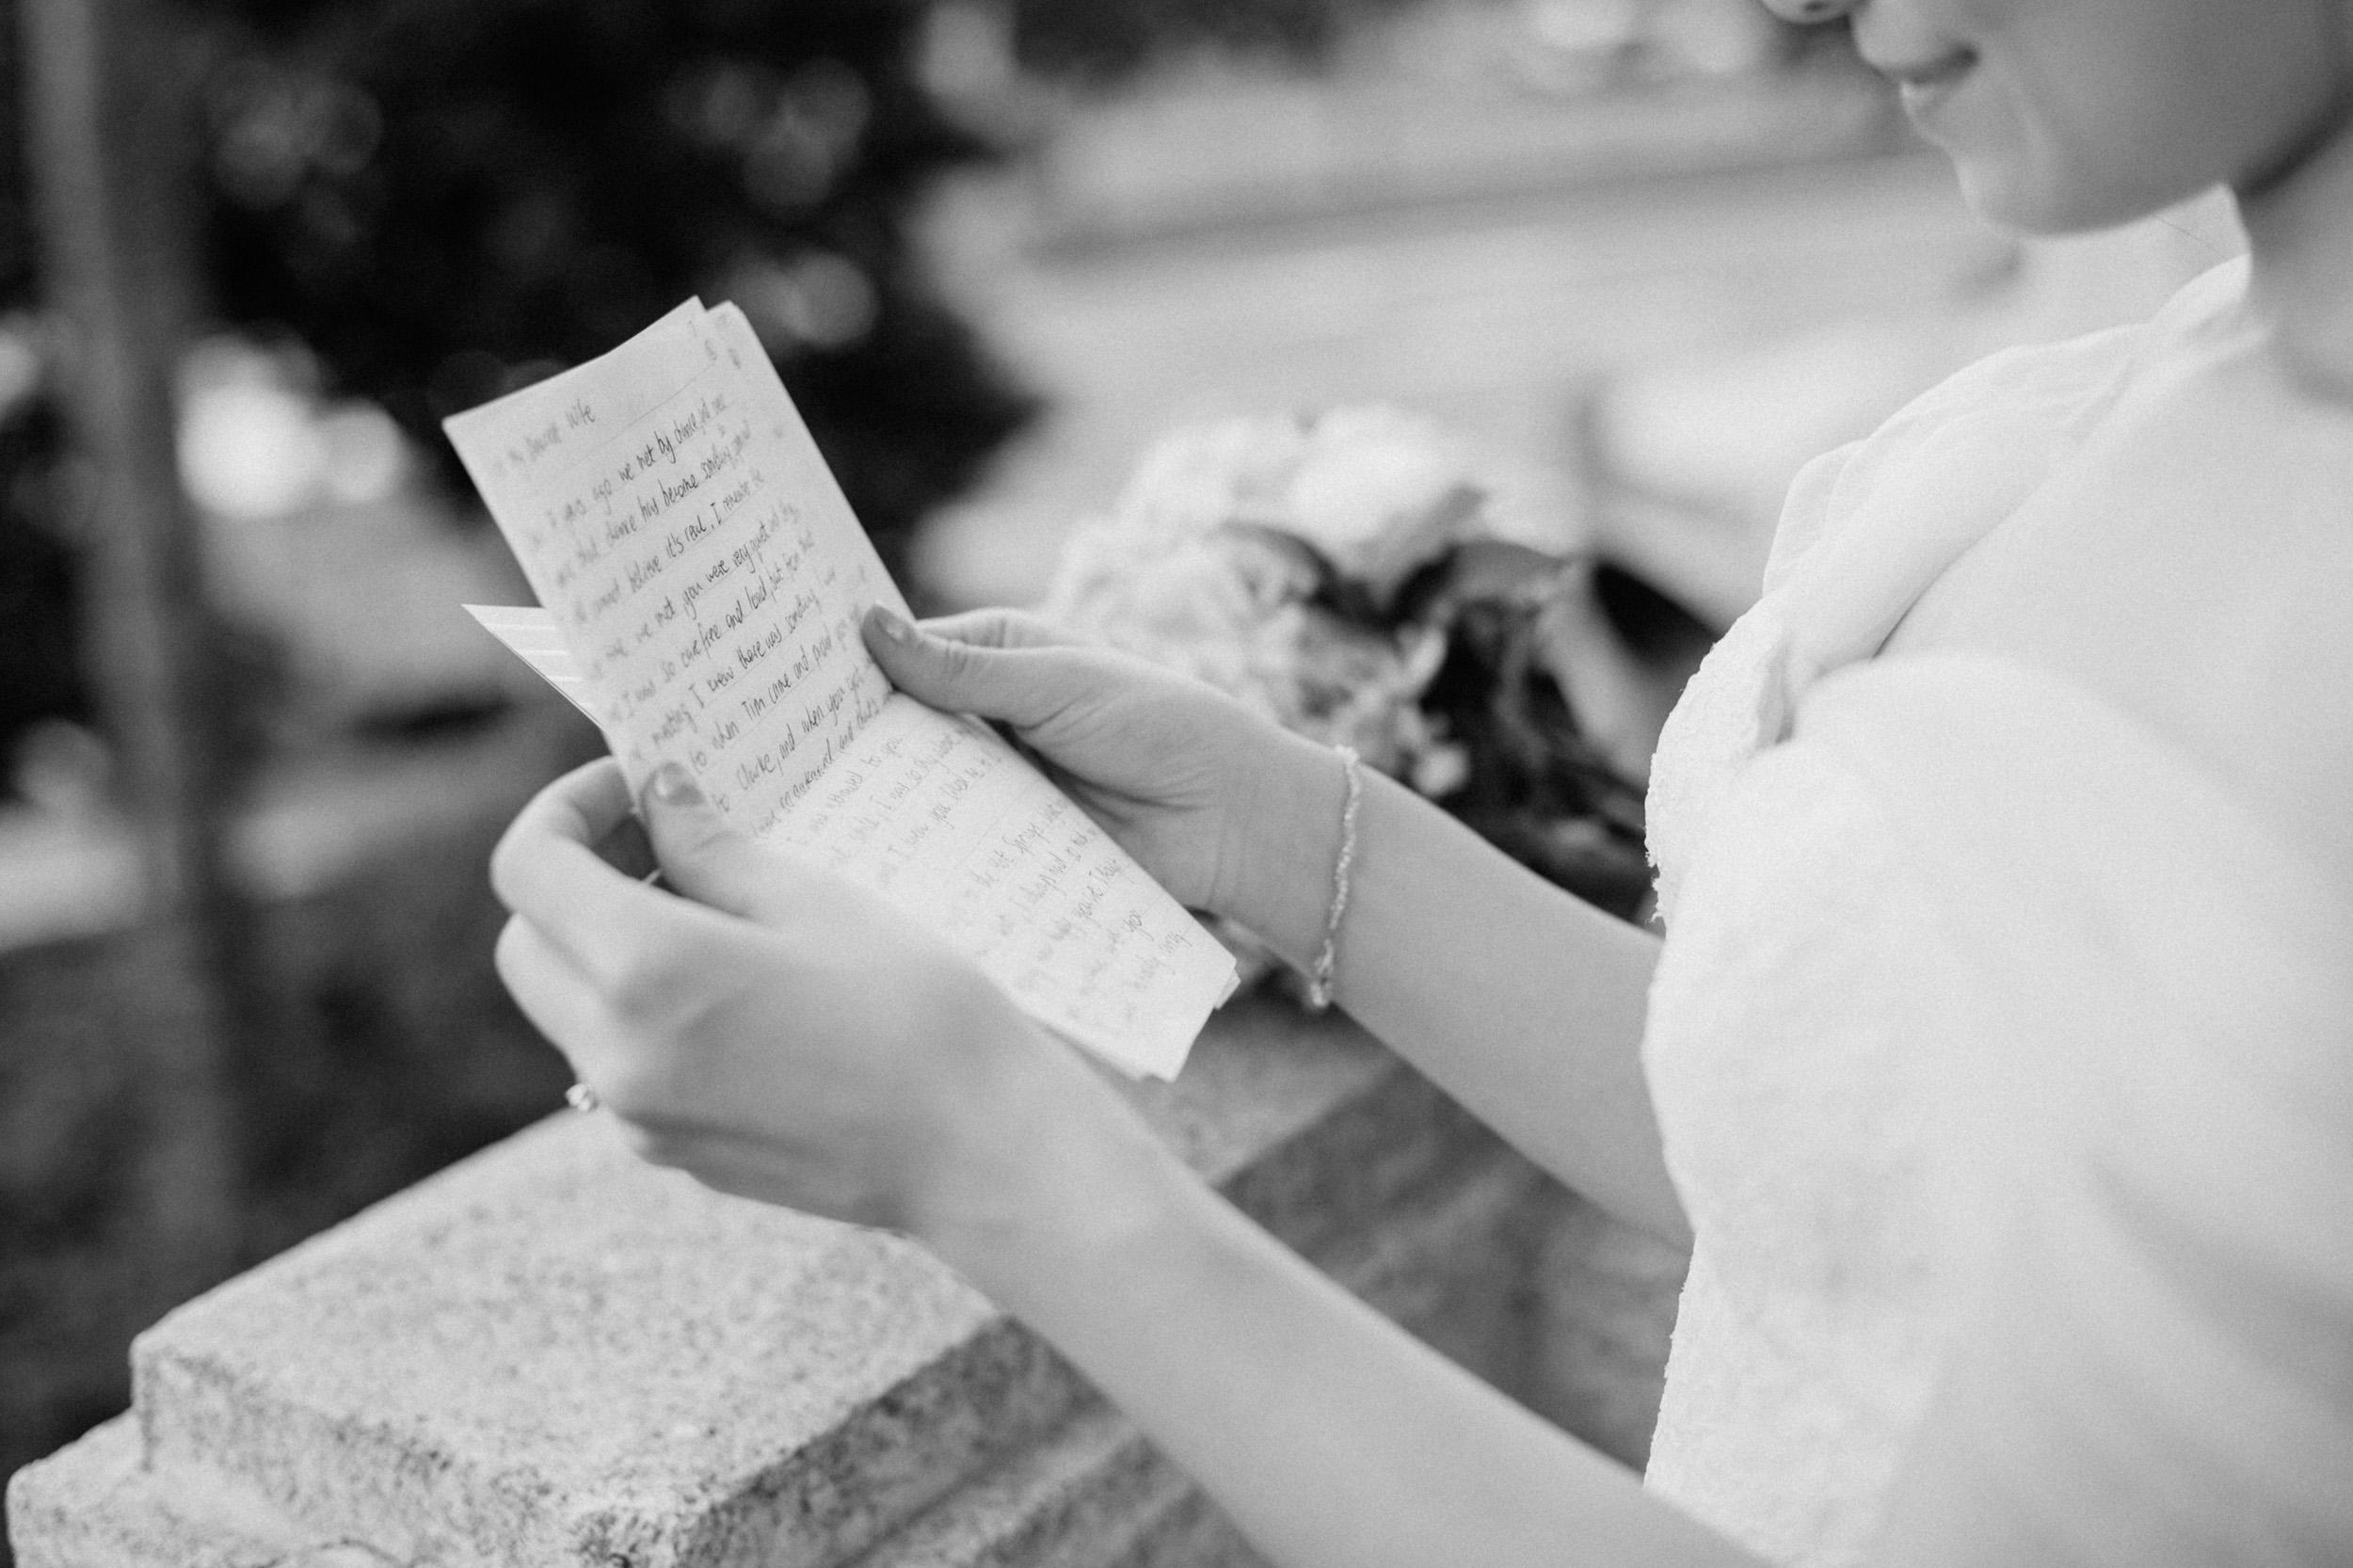 singapore-wedding-photographer-photography-wmt2017-101.jpg